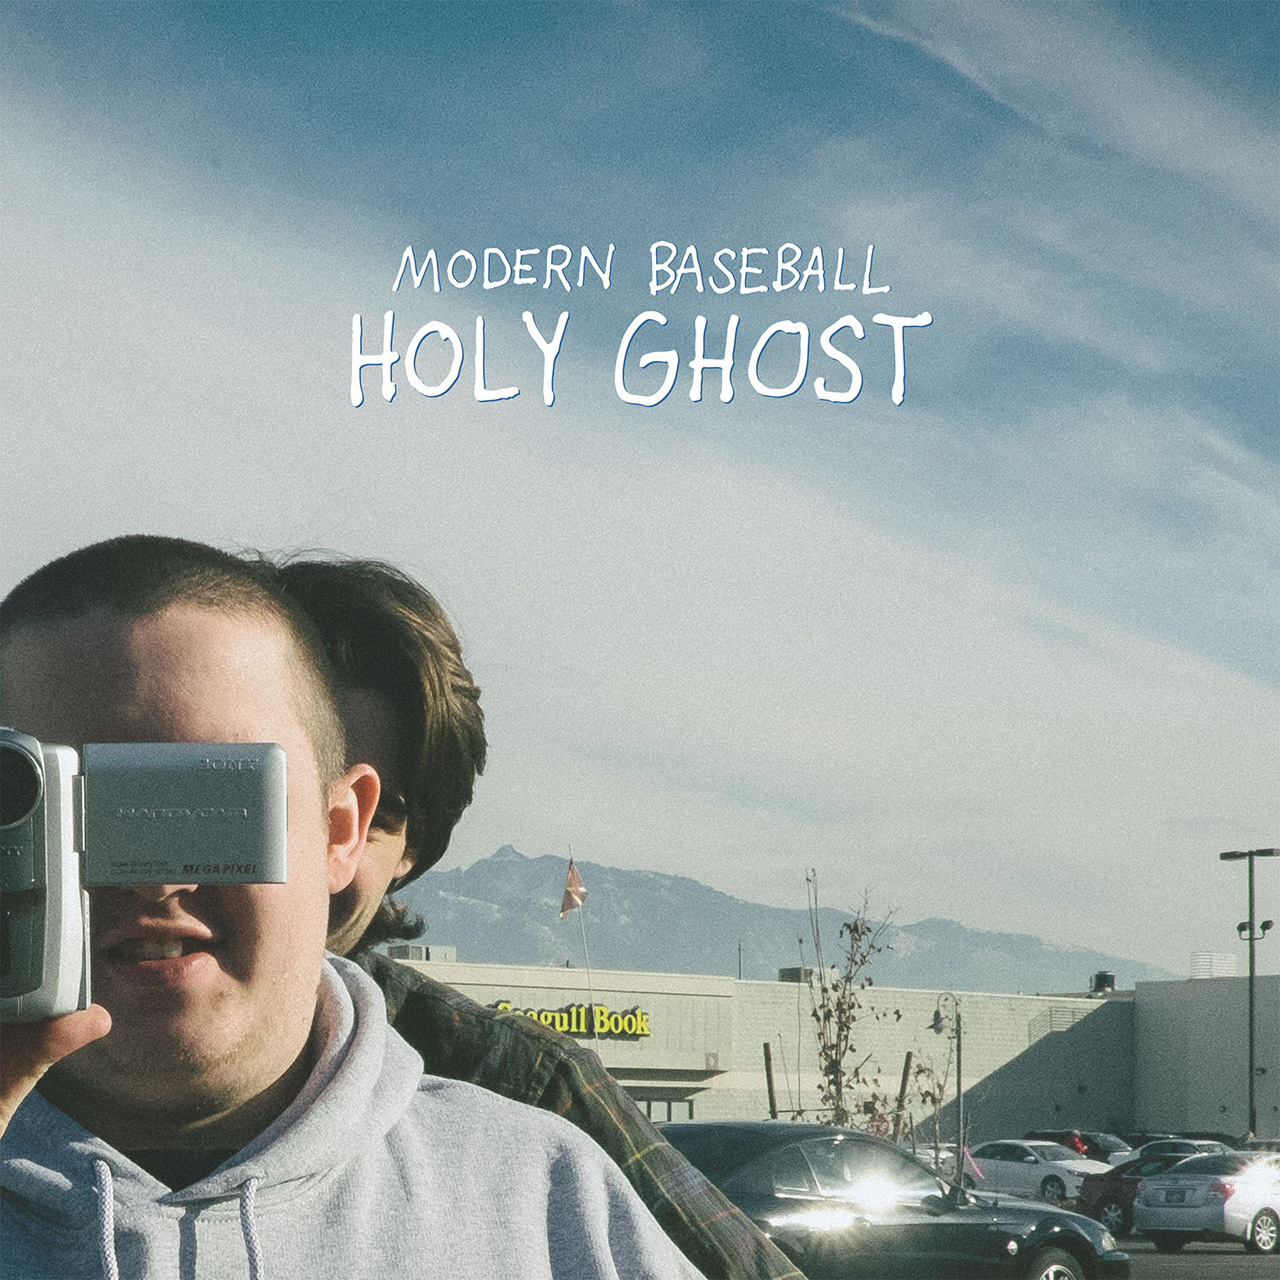 Modern Baseball — Holy Ghost